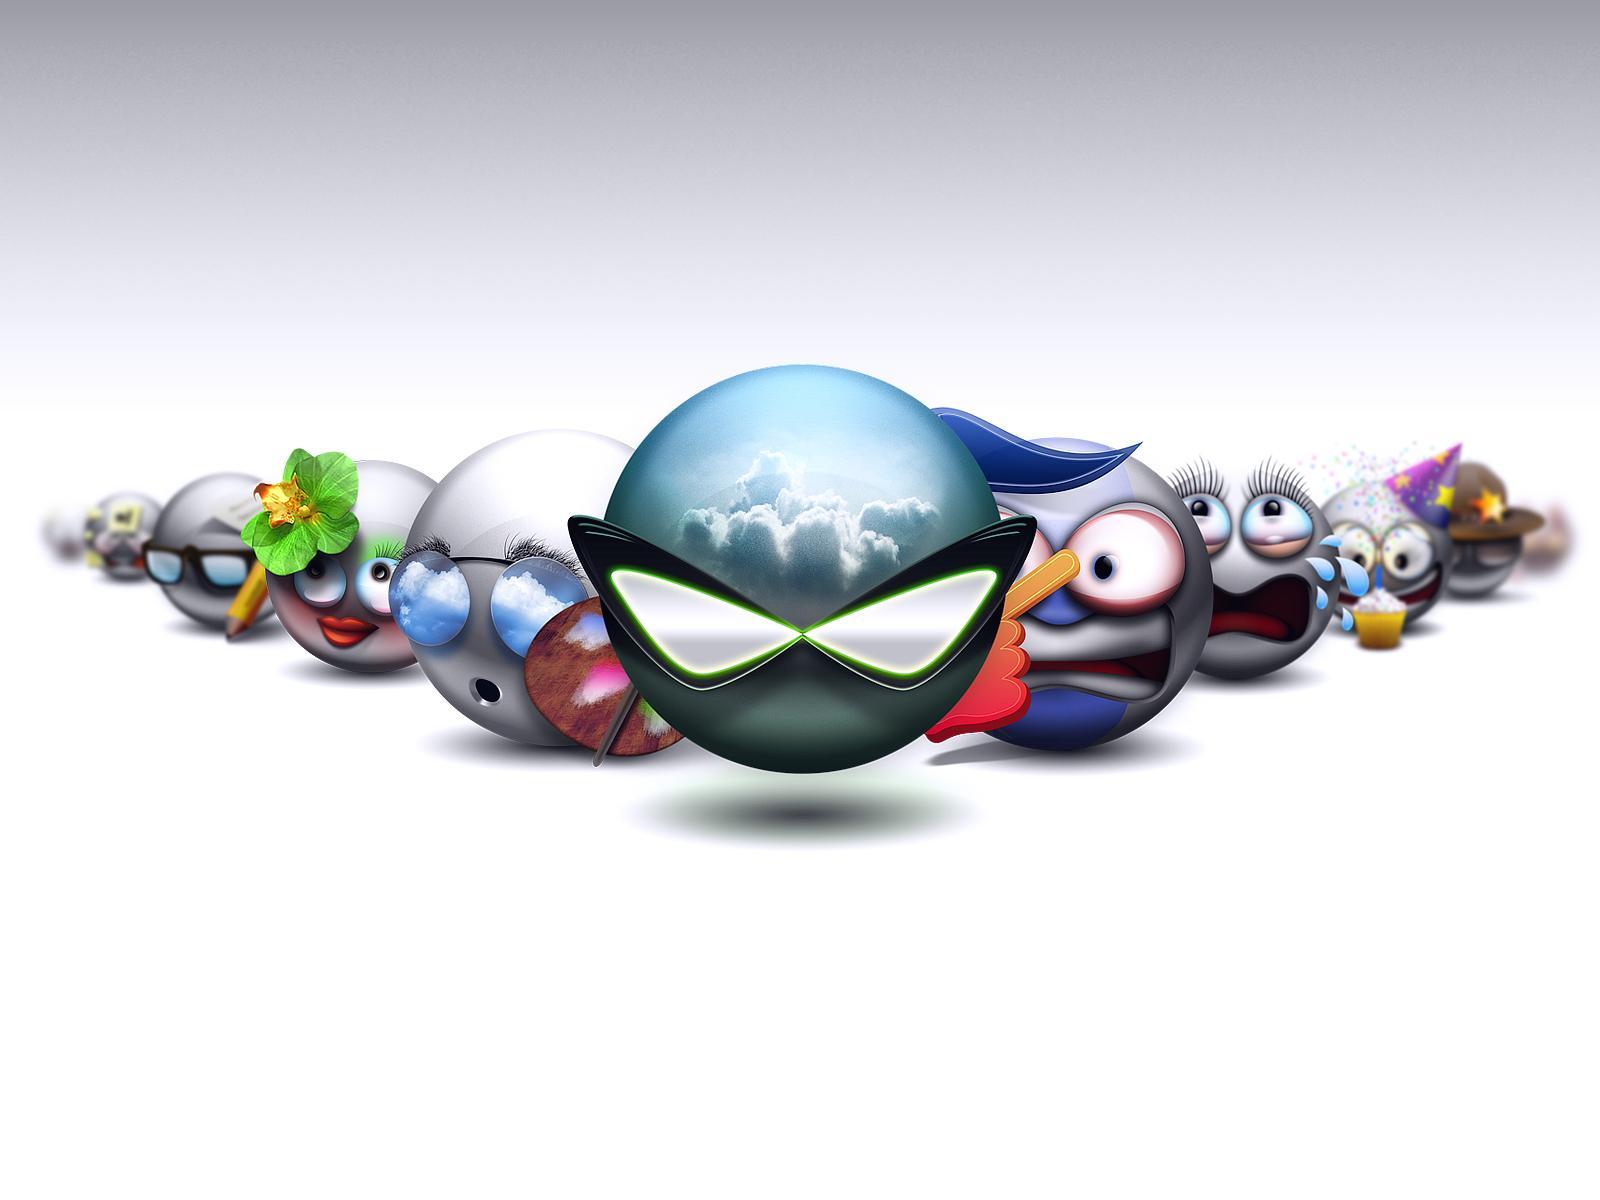 smiley faces Digital 3d desktop wallpaper screensaver background 1600x1200